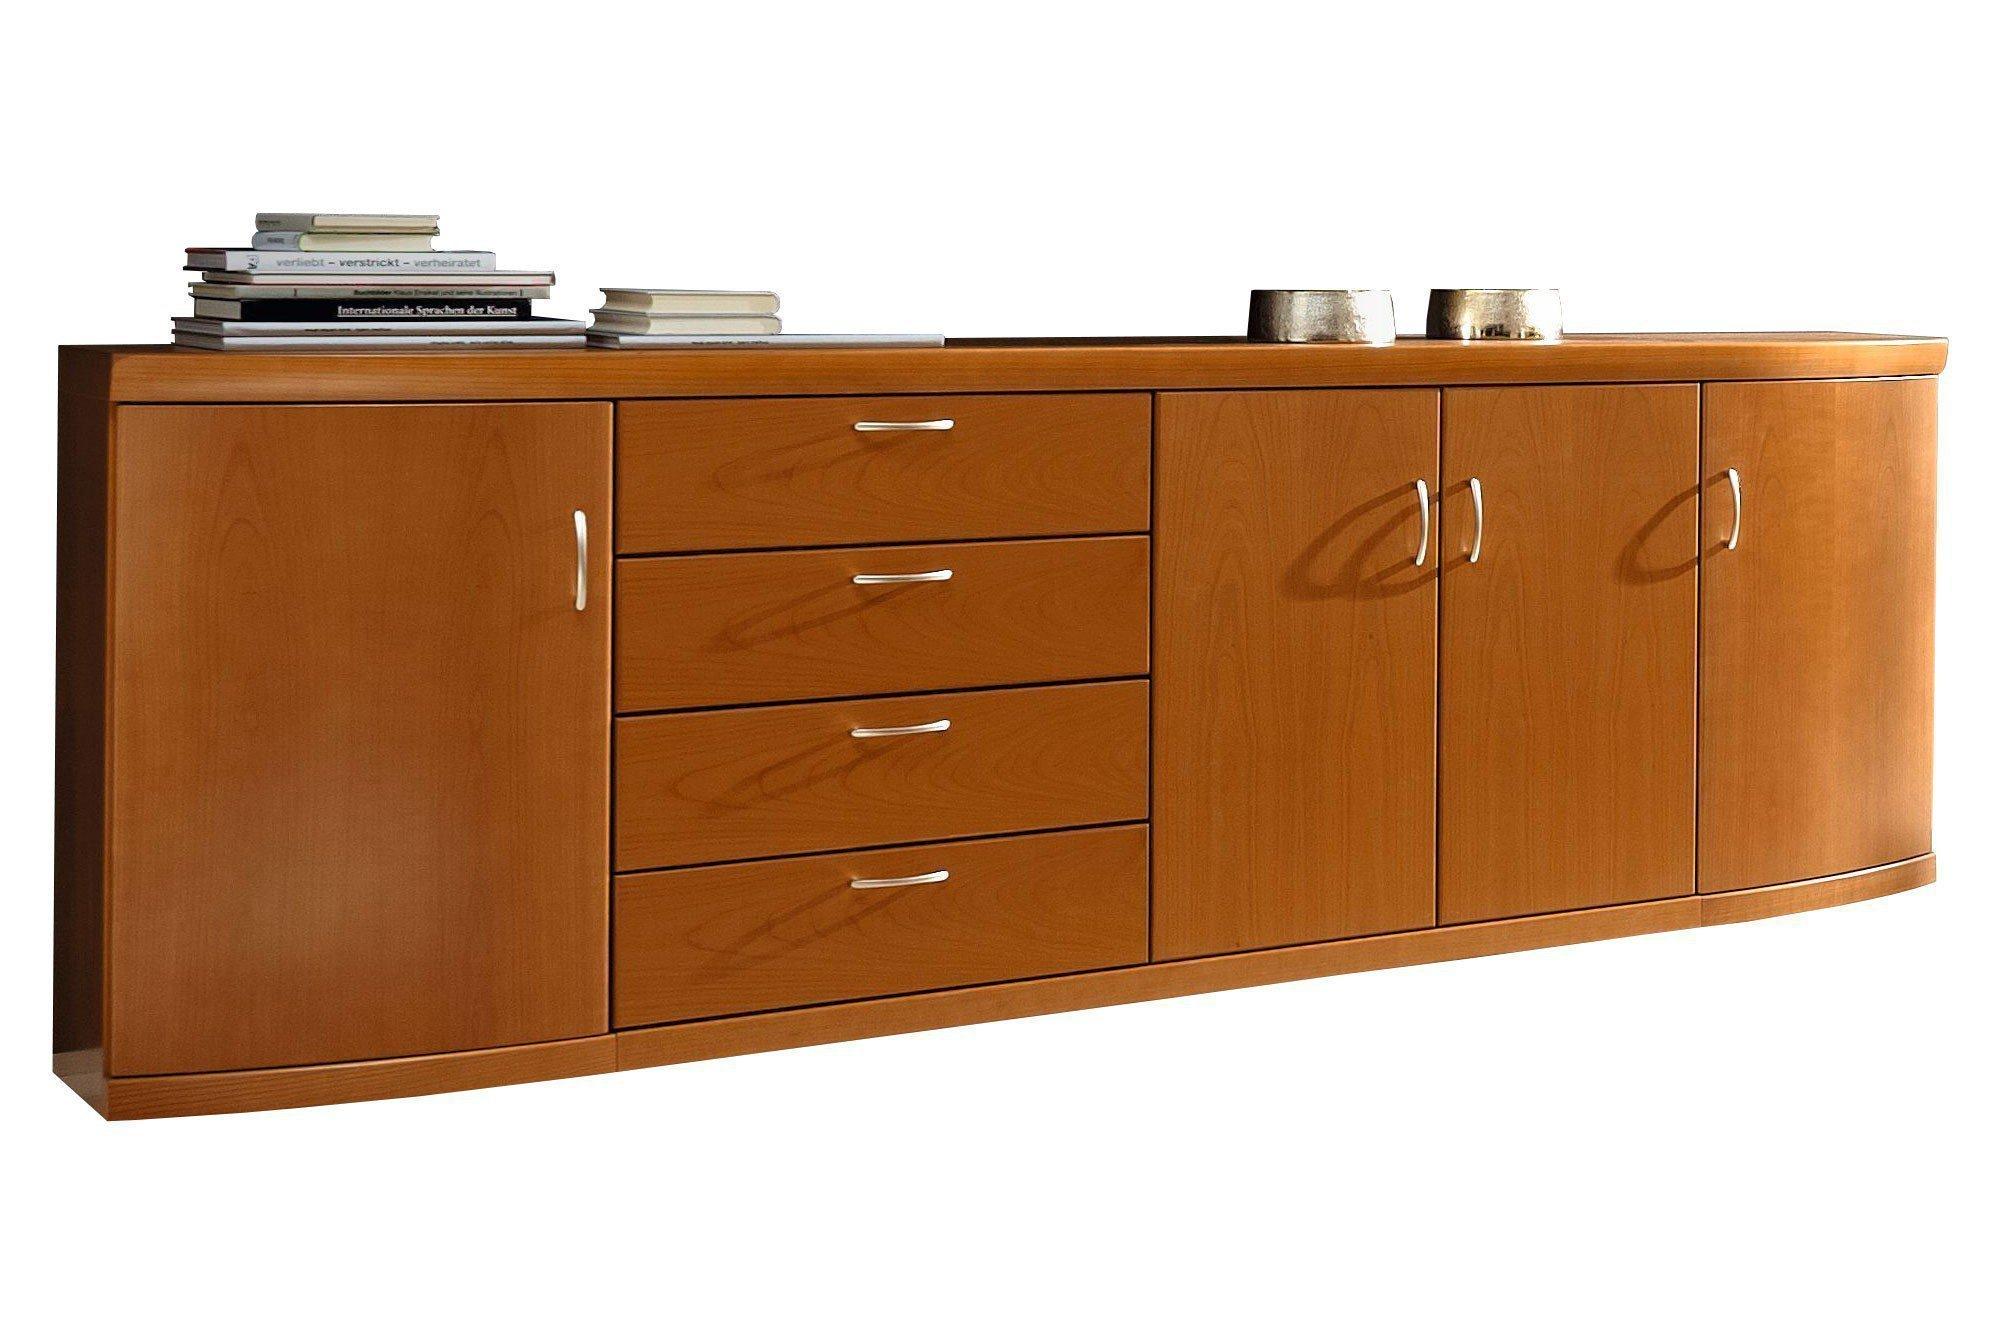 rietberger sideboard lokano kirschbaum m bel letz ihr online shop. Black Bedroom Furniture Sets. Home Design Ideas